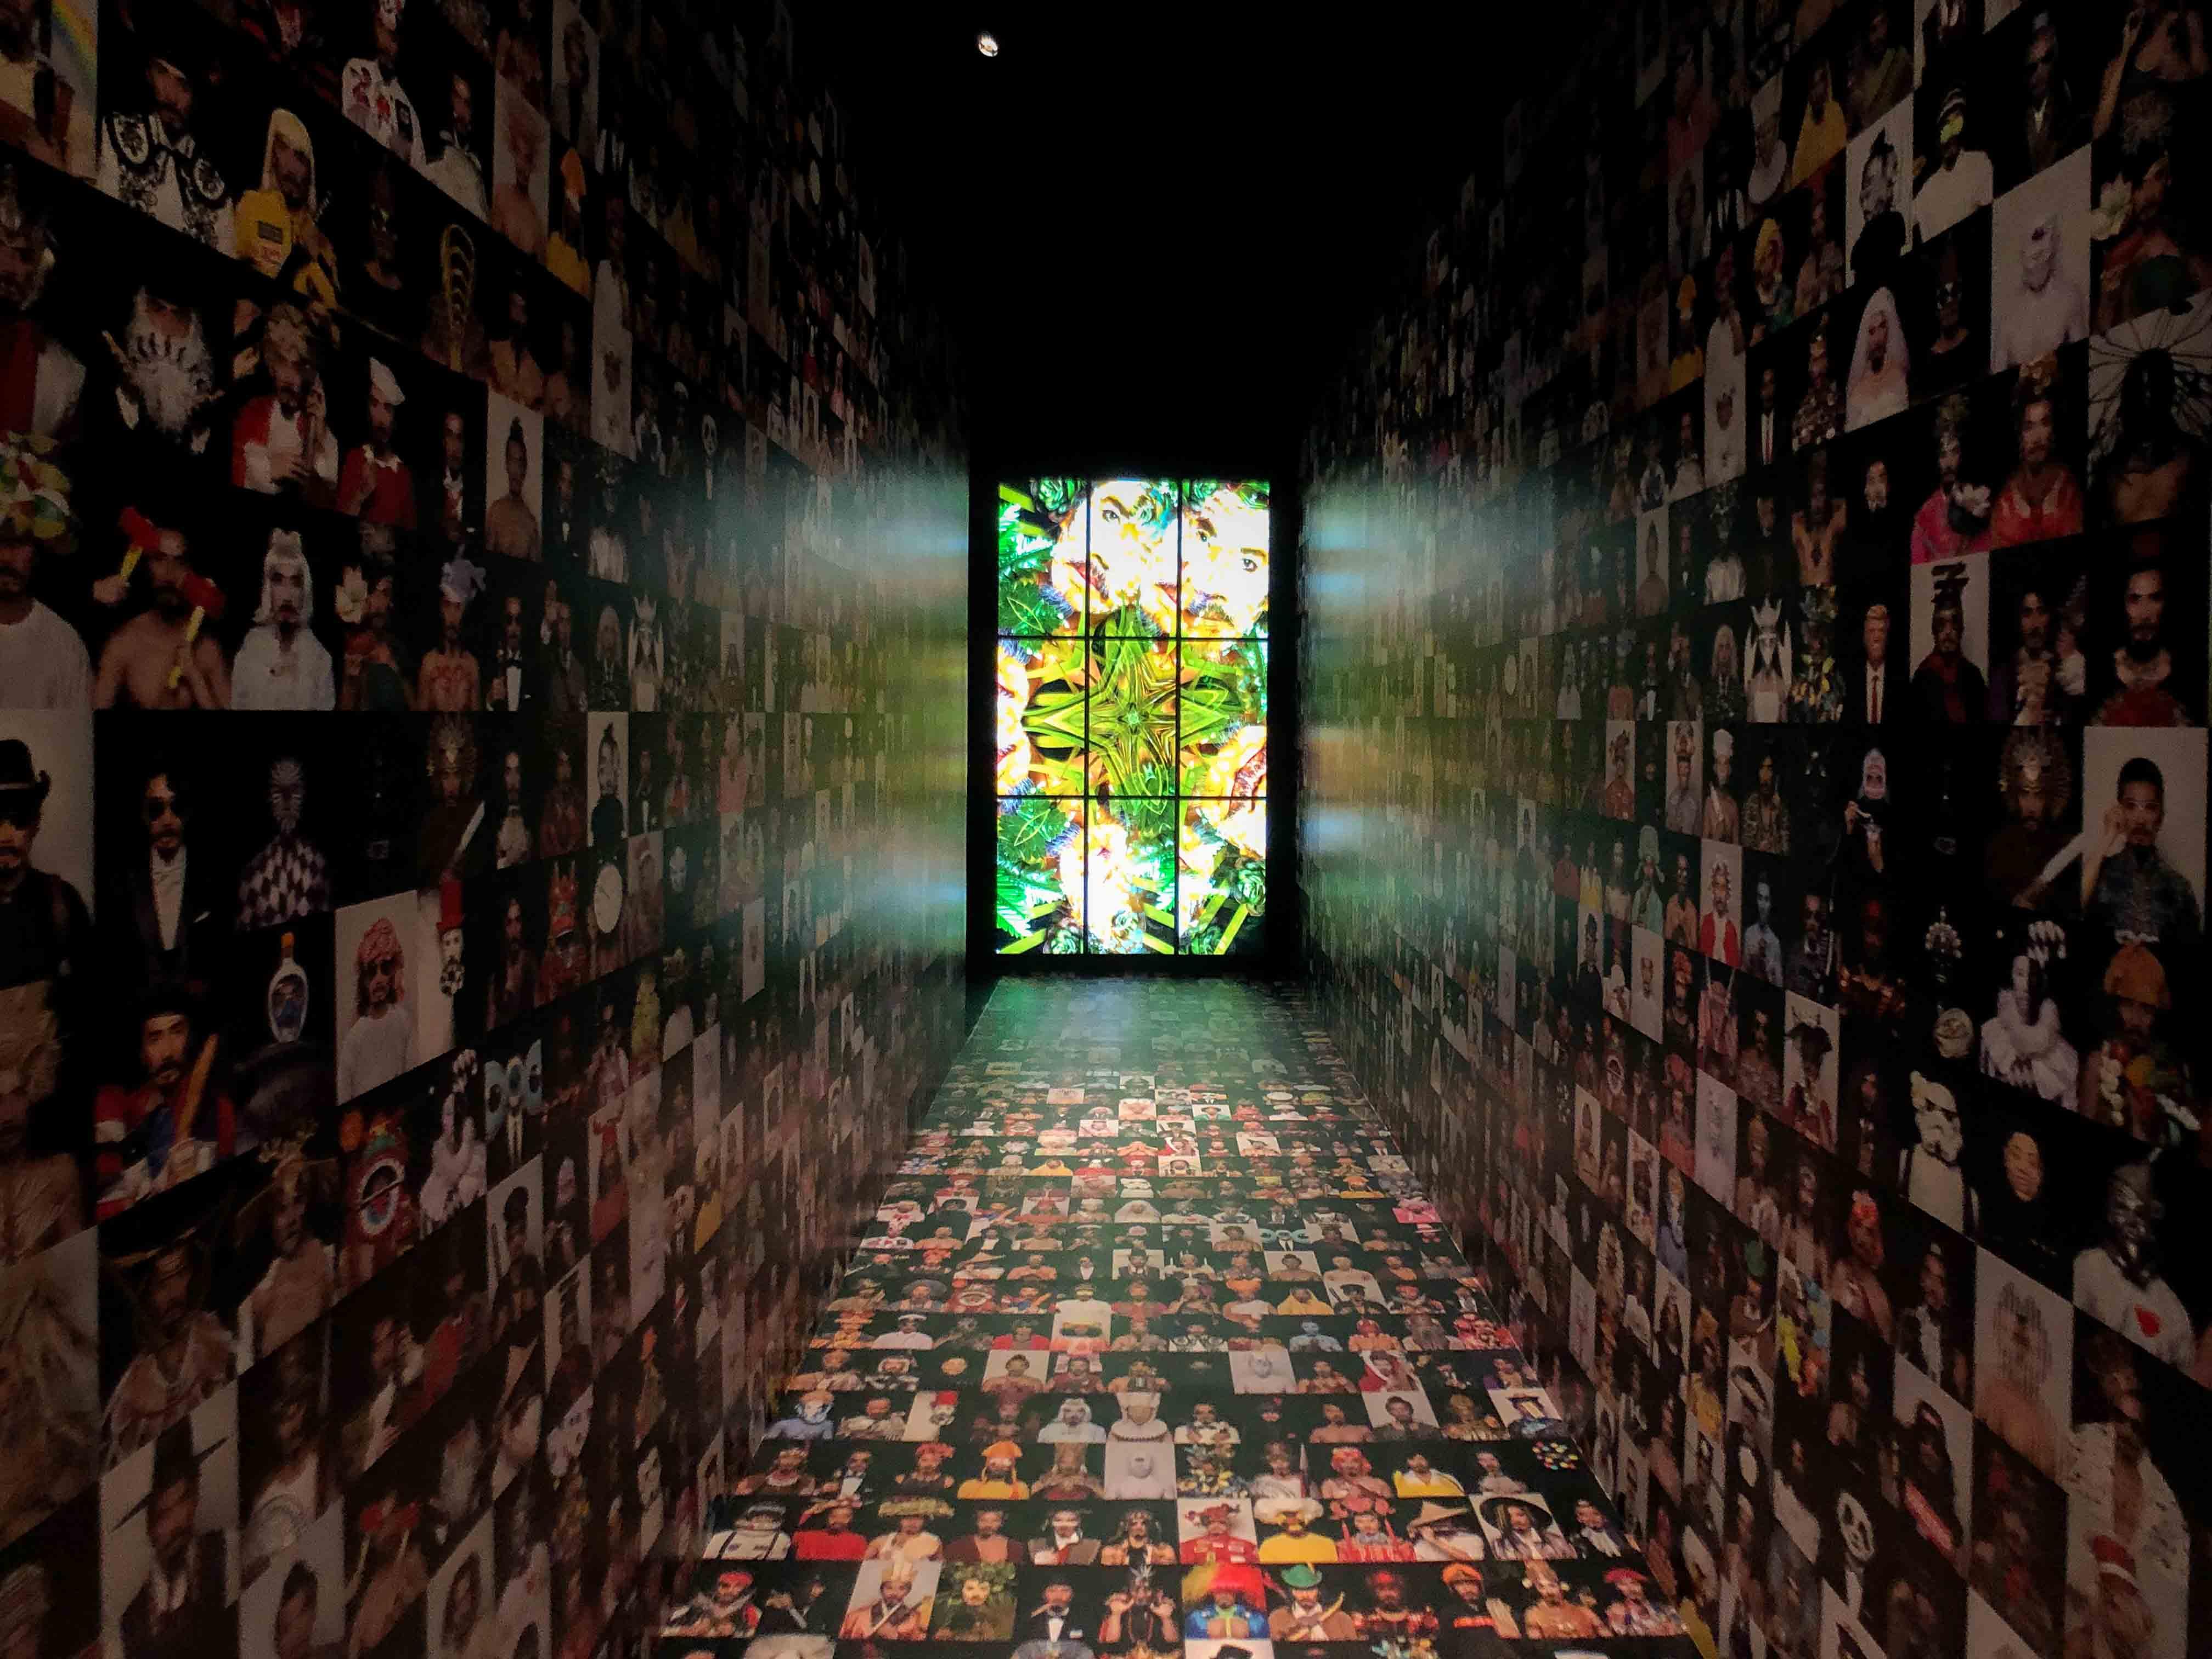 digimuse-presents-national-museum-darrenbloggie